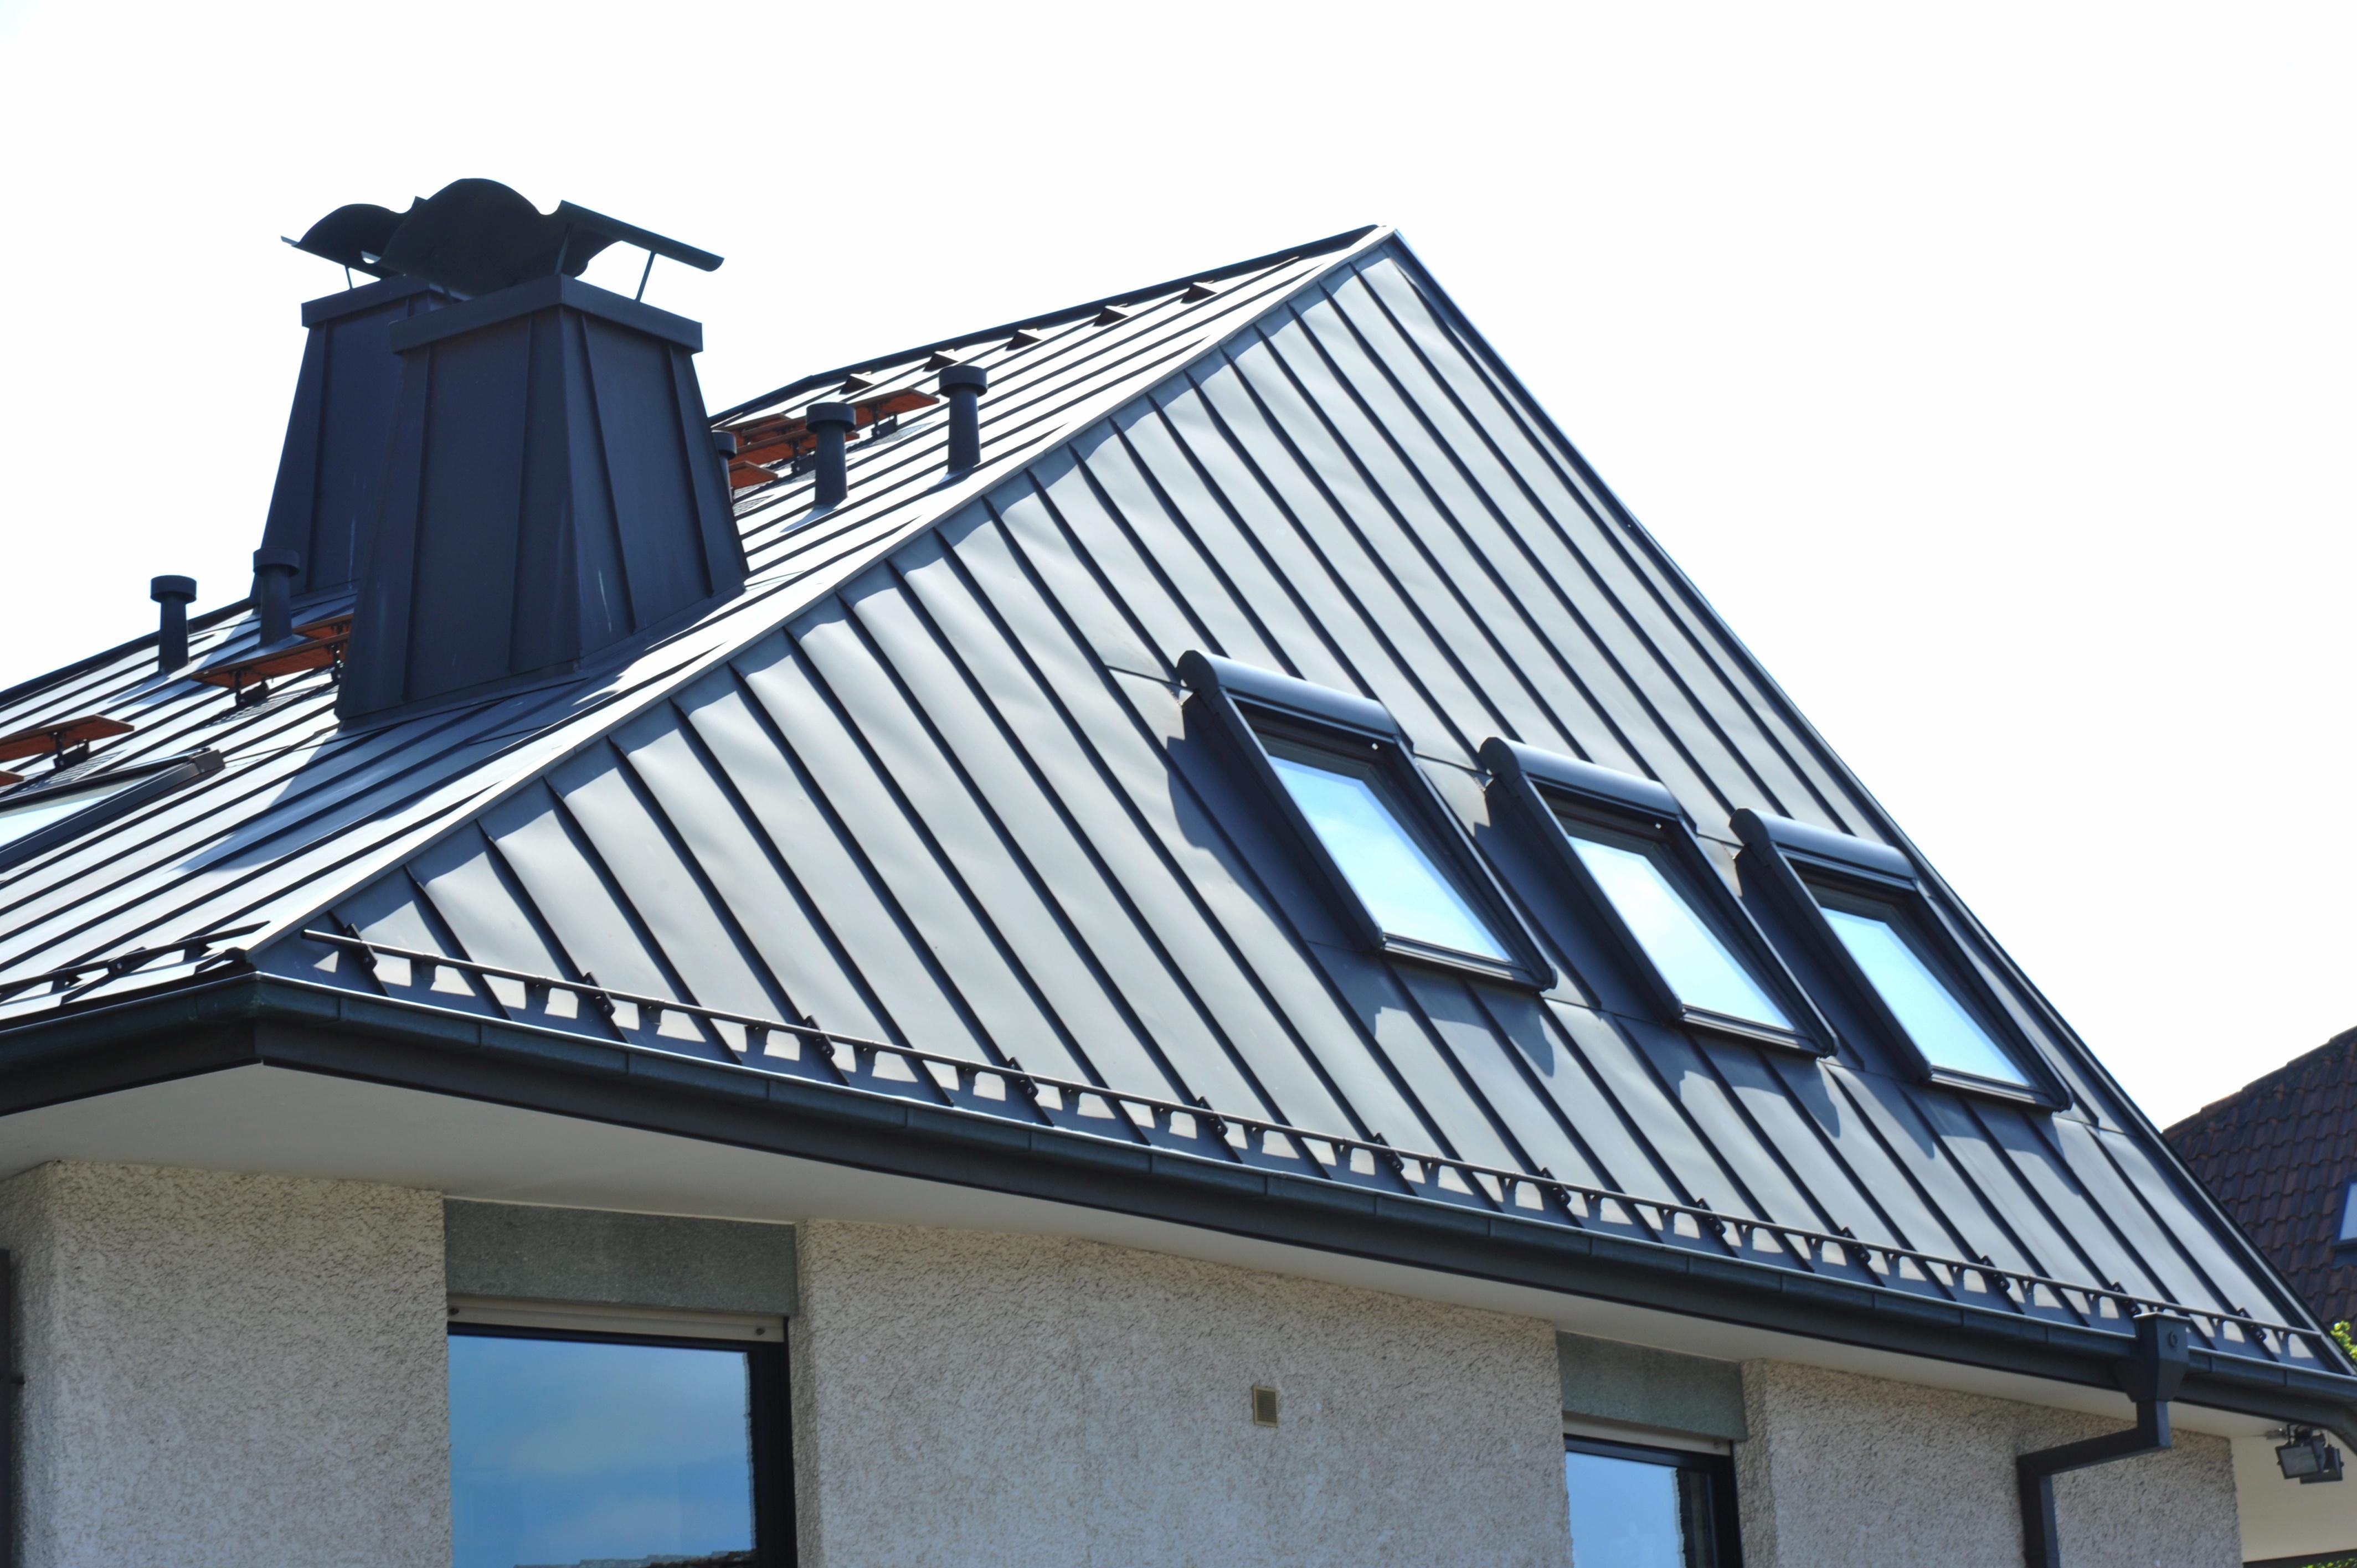 Bac acier isole anti condensation for Differente toiture maison